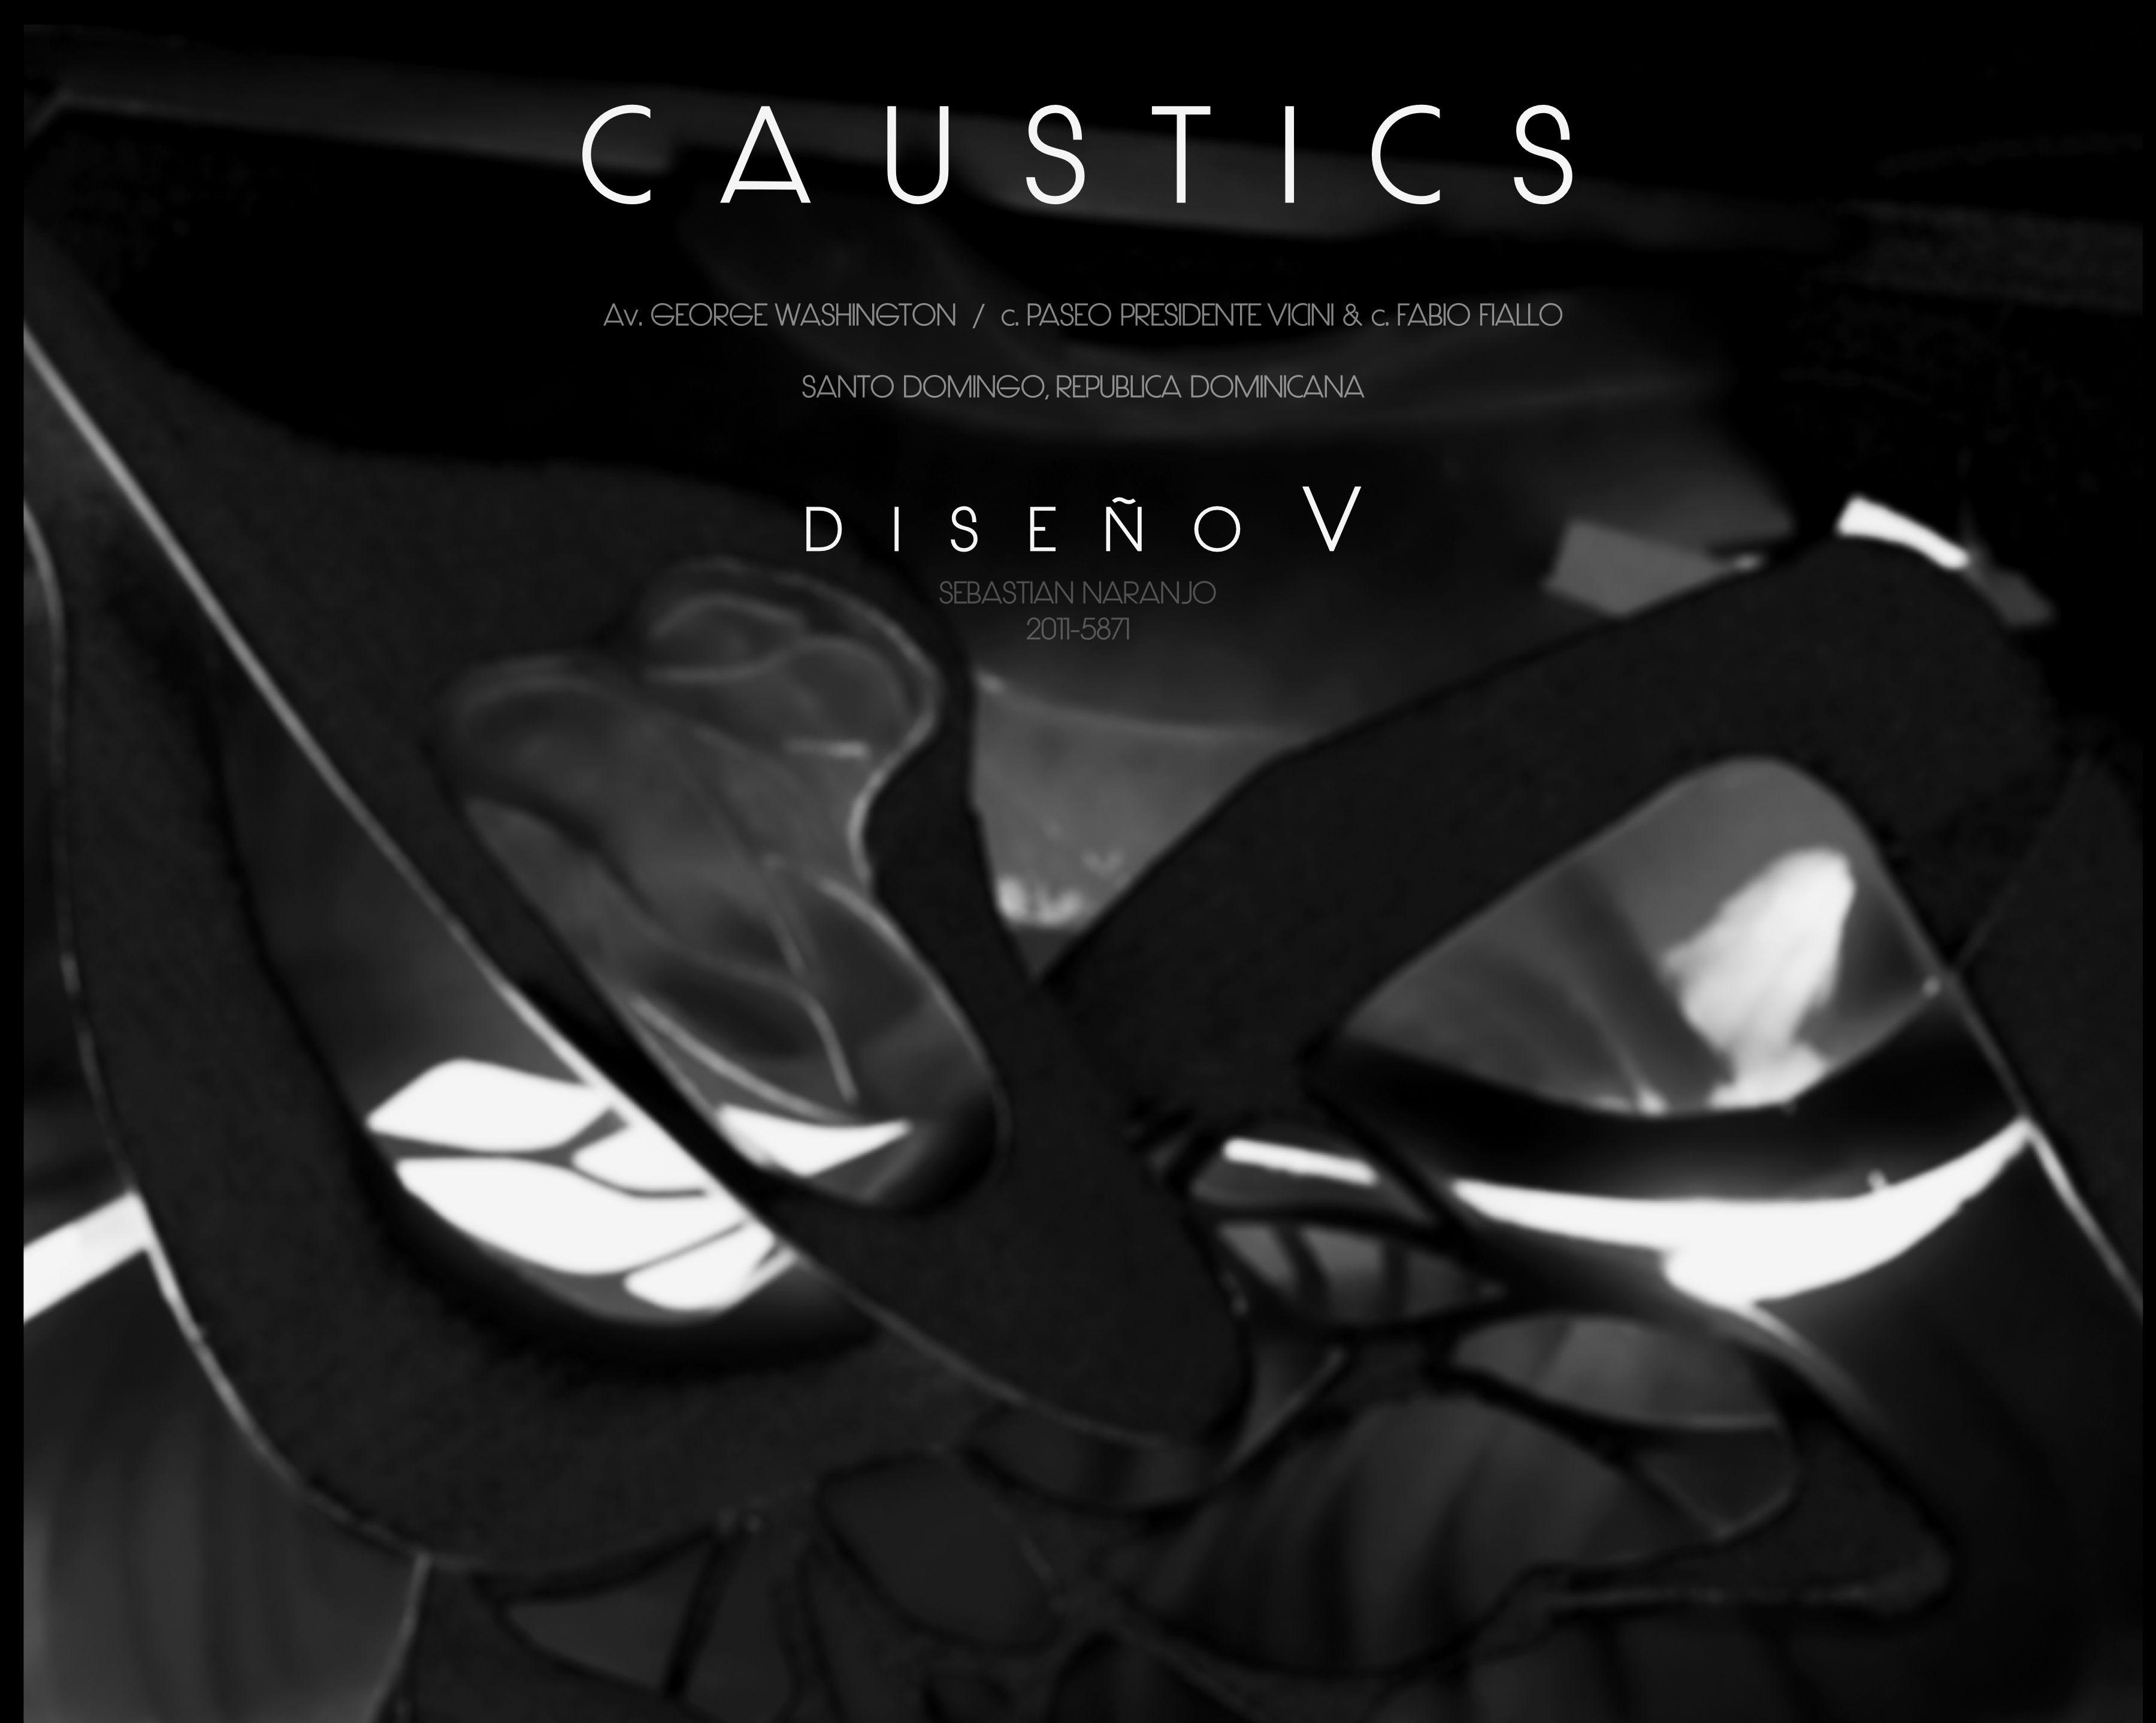 CAUSTICS - D5 by Sebastian Naranjo #board #presentation #project #caustics #plaza #urban #public #design #architecture #model #arquitectura #diseño #contexto